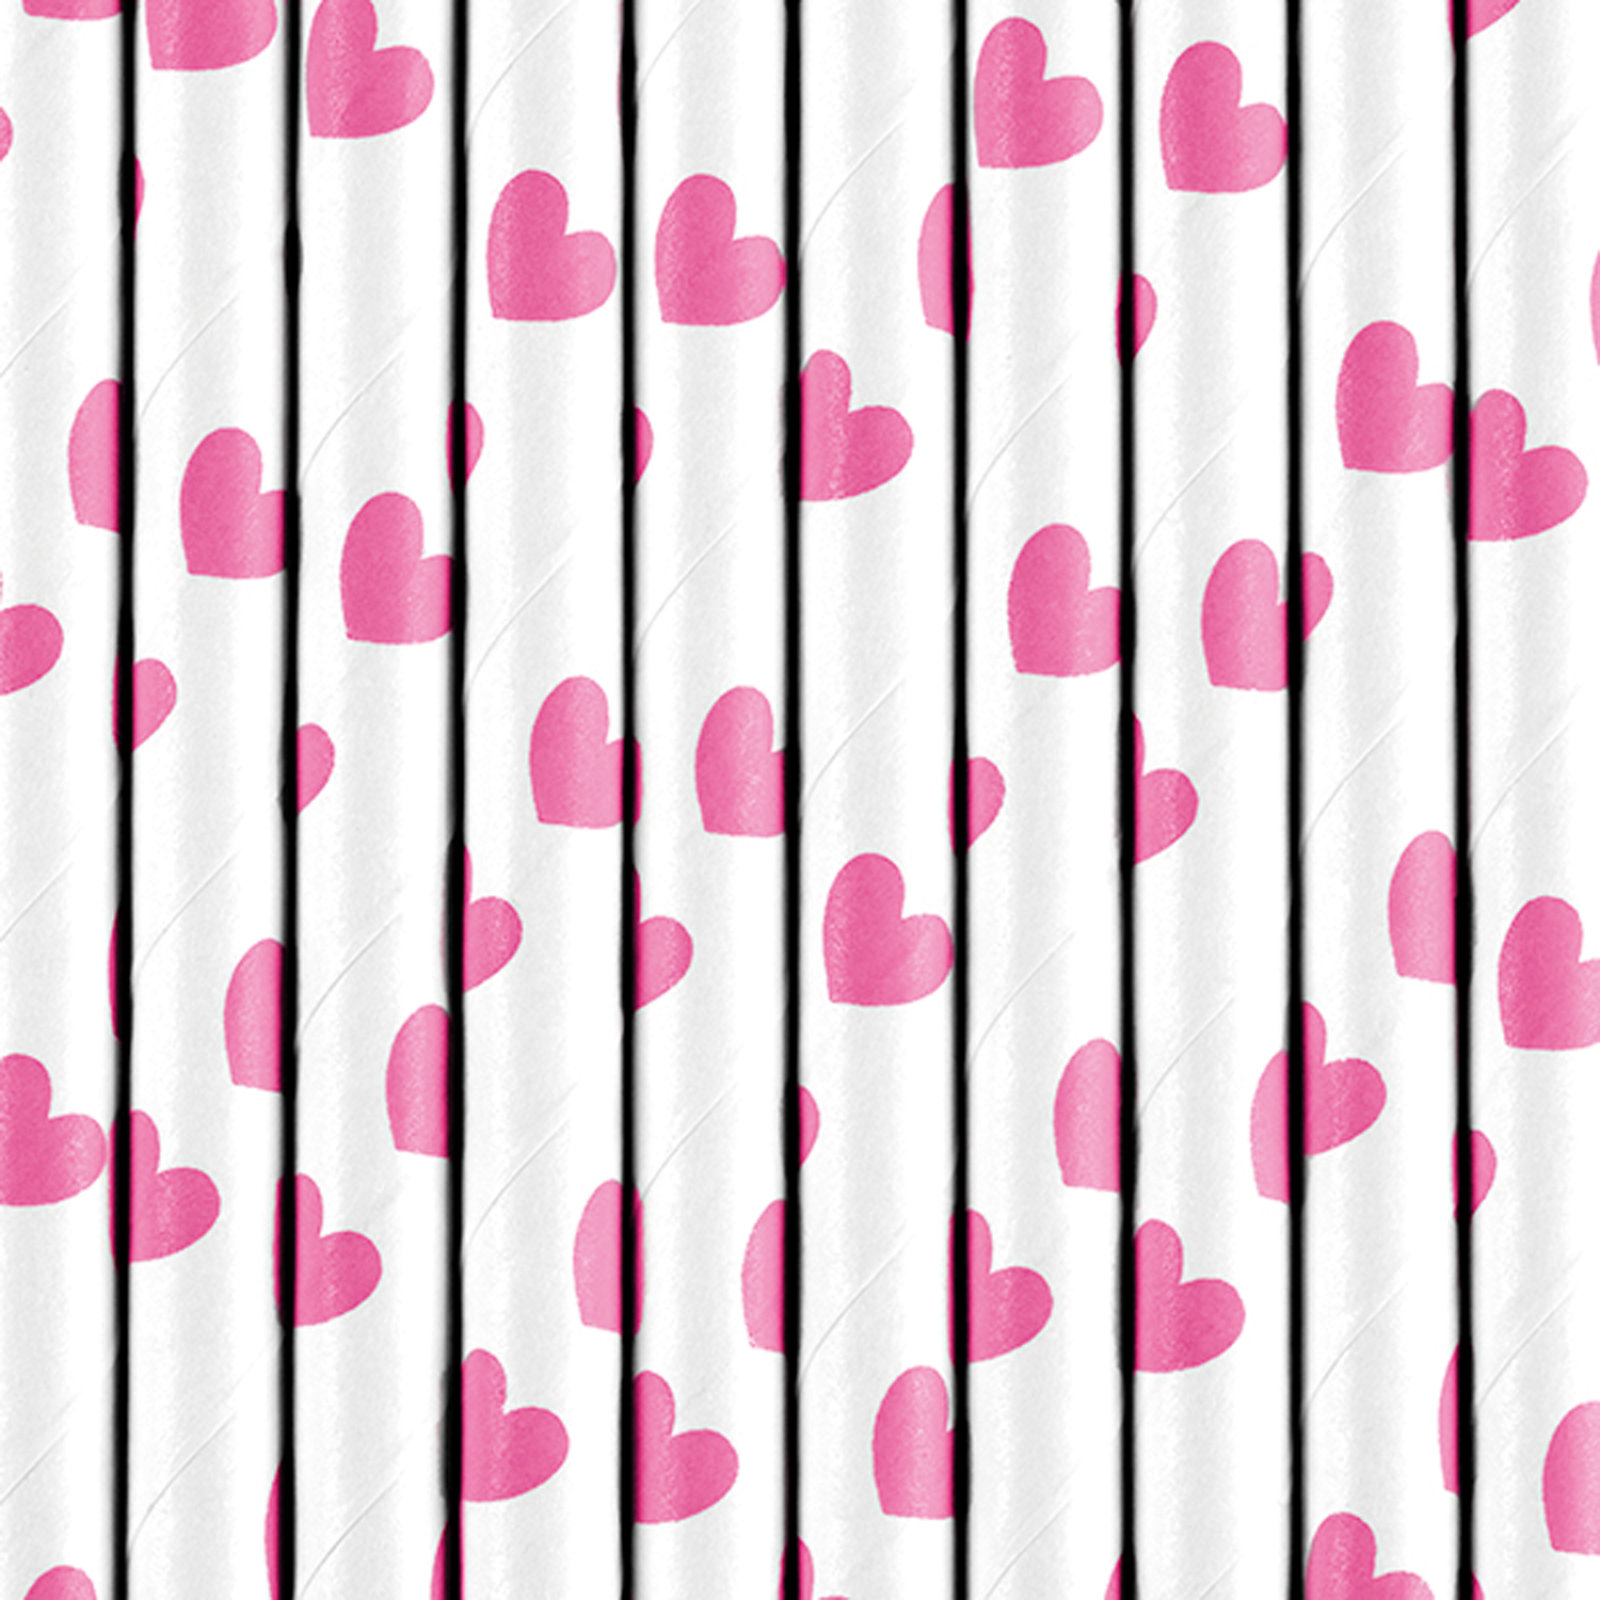 10 papier strohhalme rosa herzen der ideen. Black Bedroom Furniture Sets. Home Design Ideas